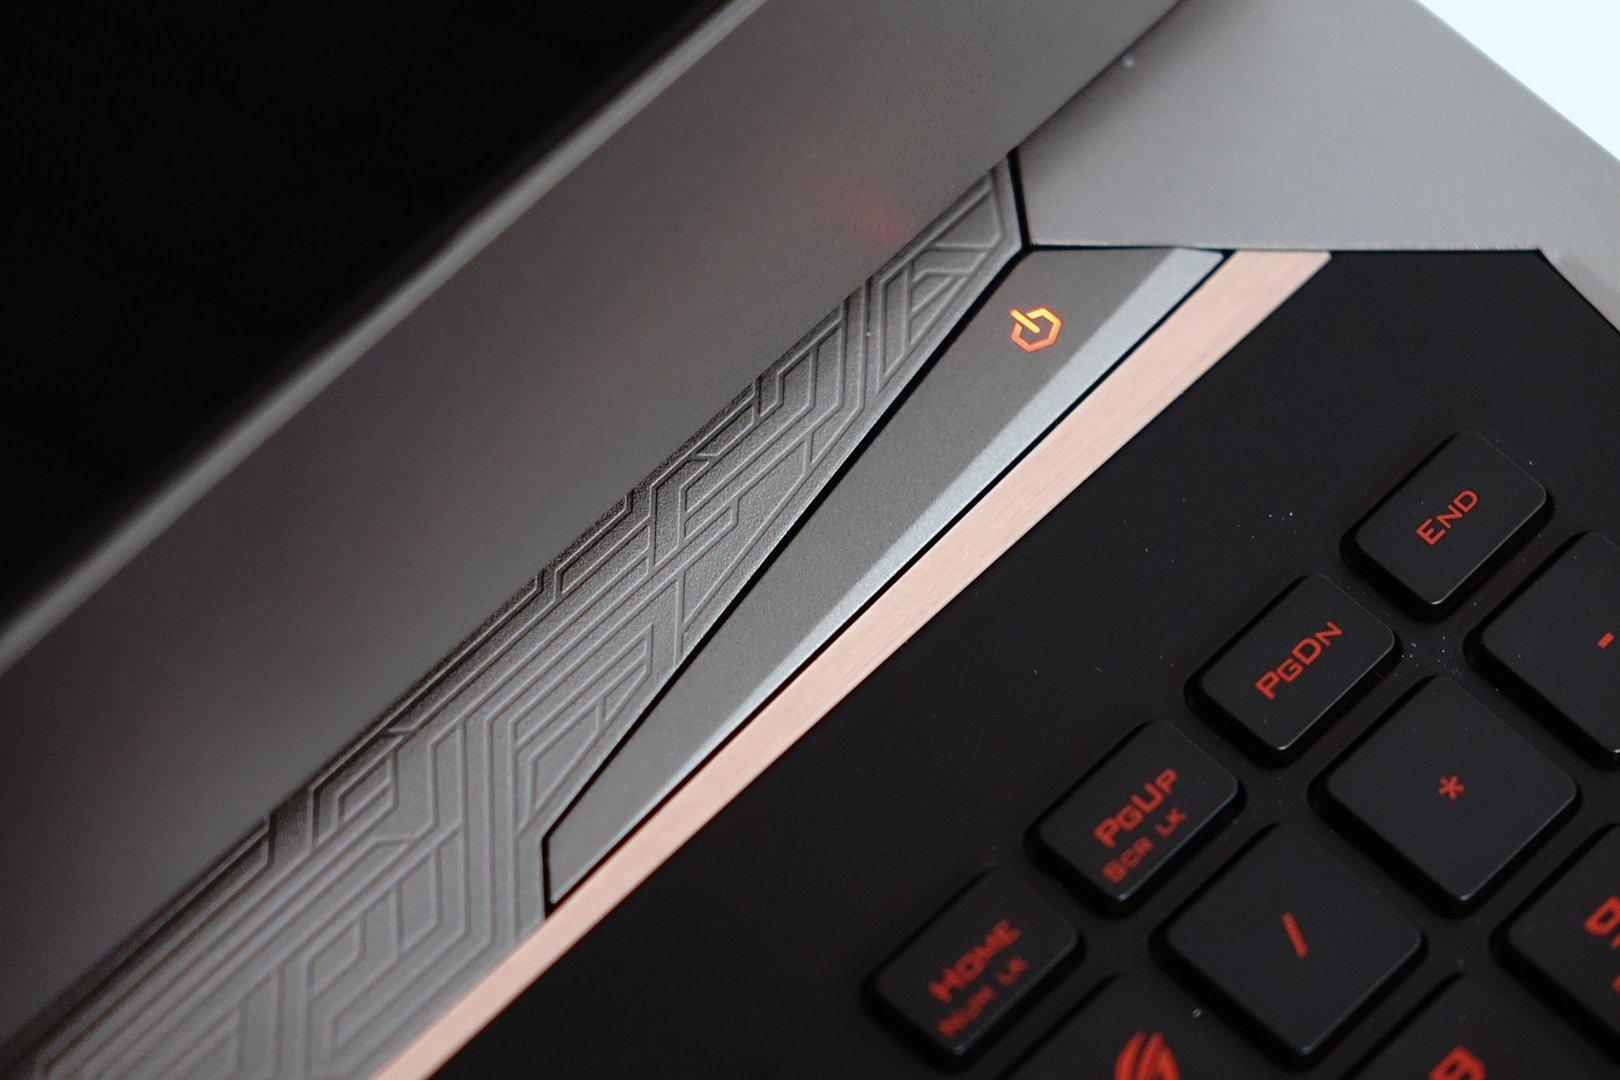 Asus ROG G752VS mit GeForce GTX 1070